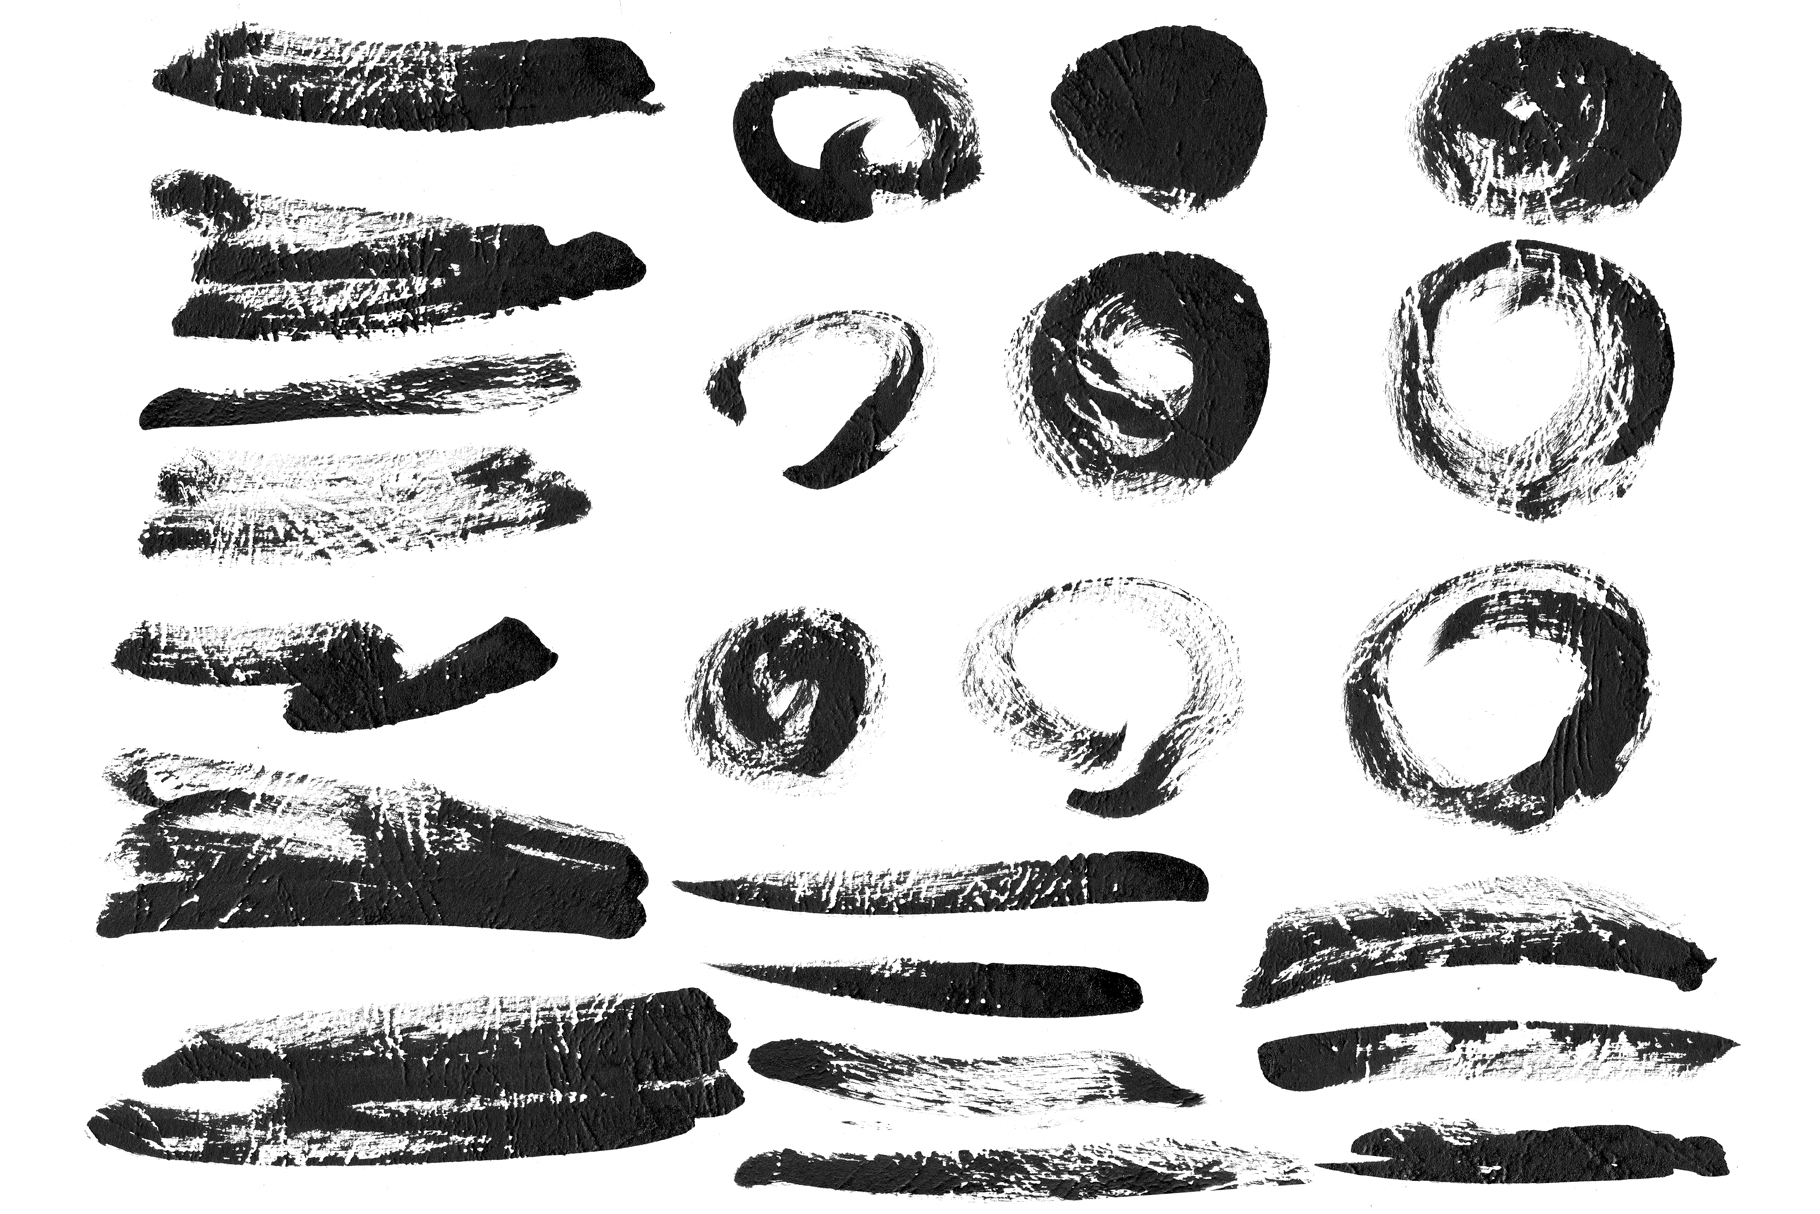 516 textures big set. example image 5